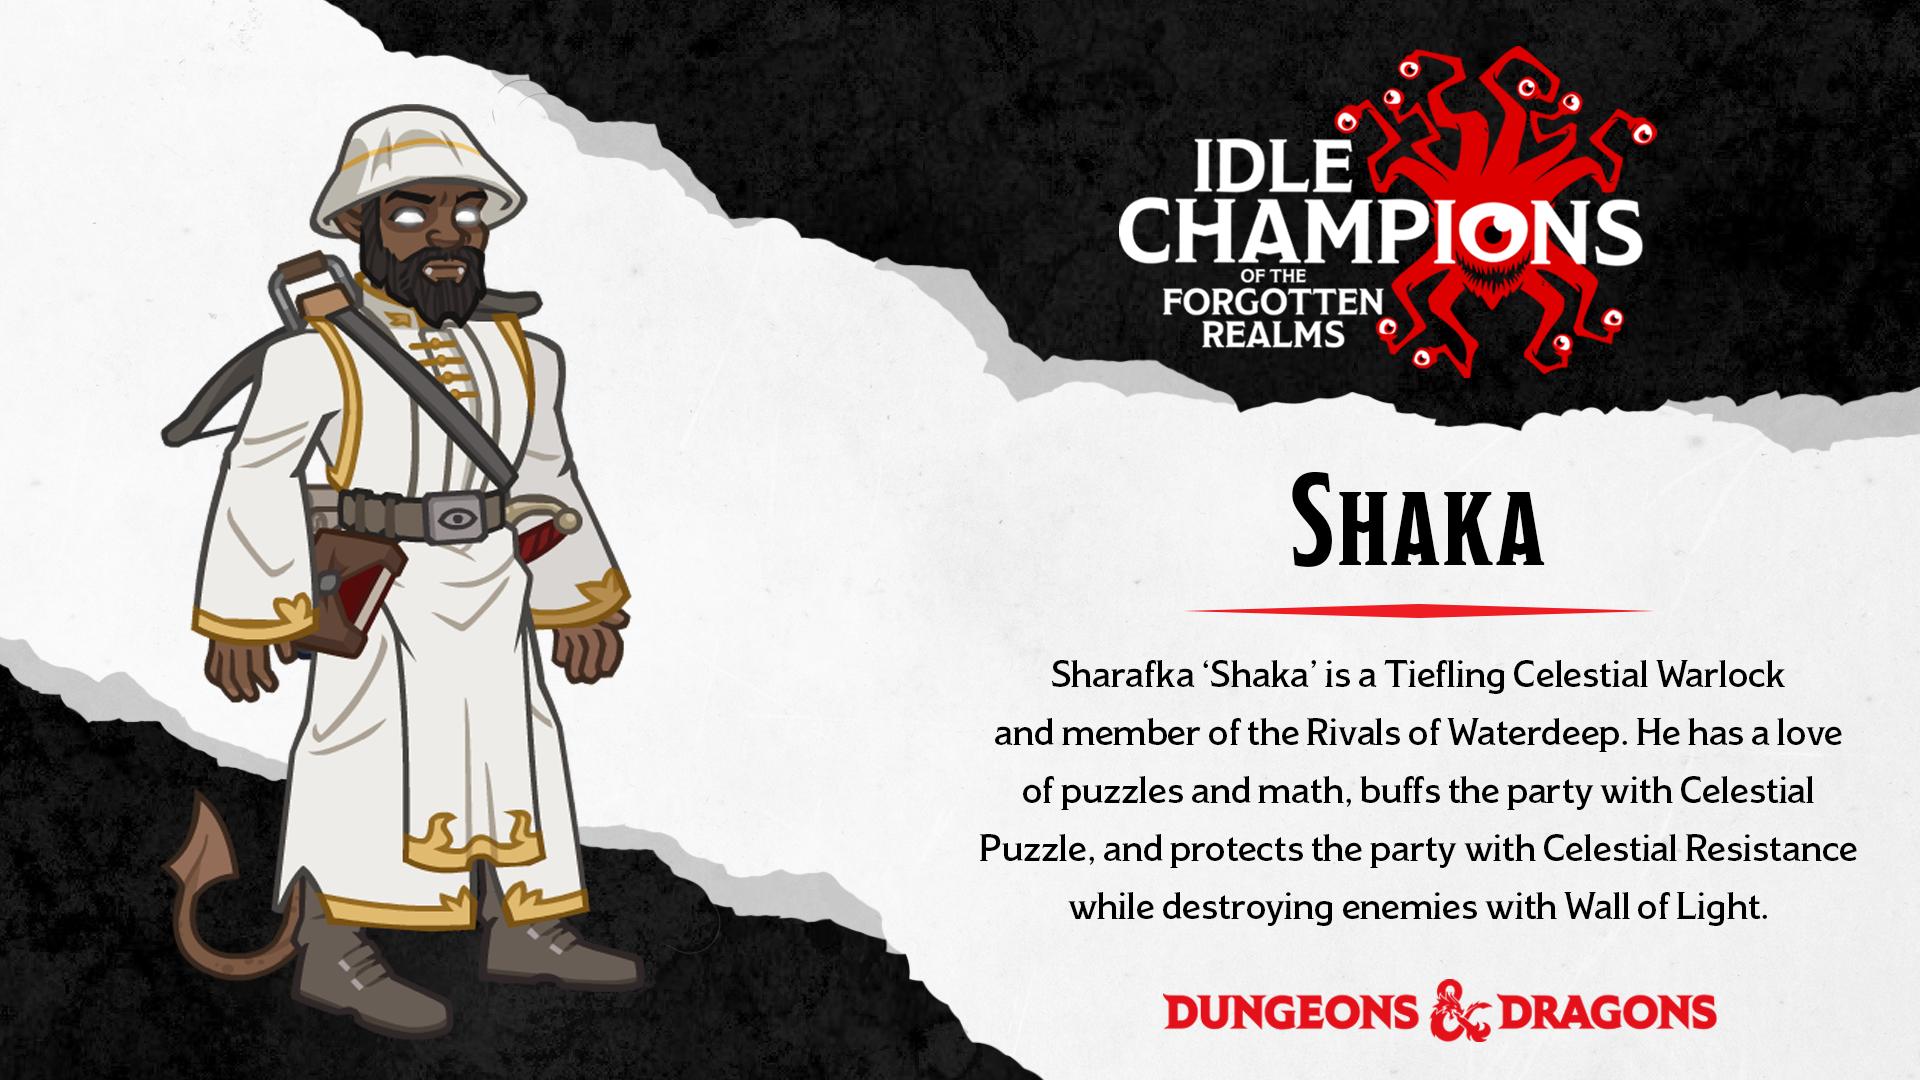 Dungeons & Dragons Shaka Shareef Jackson